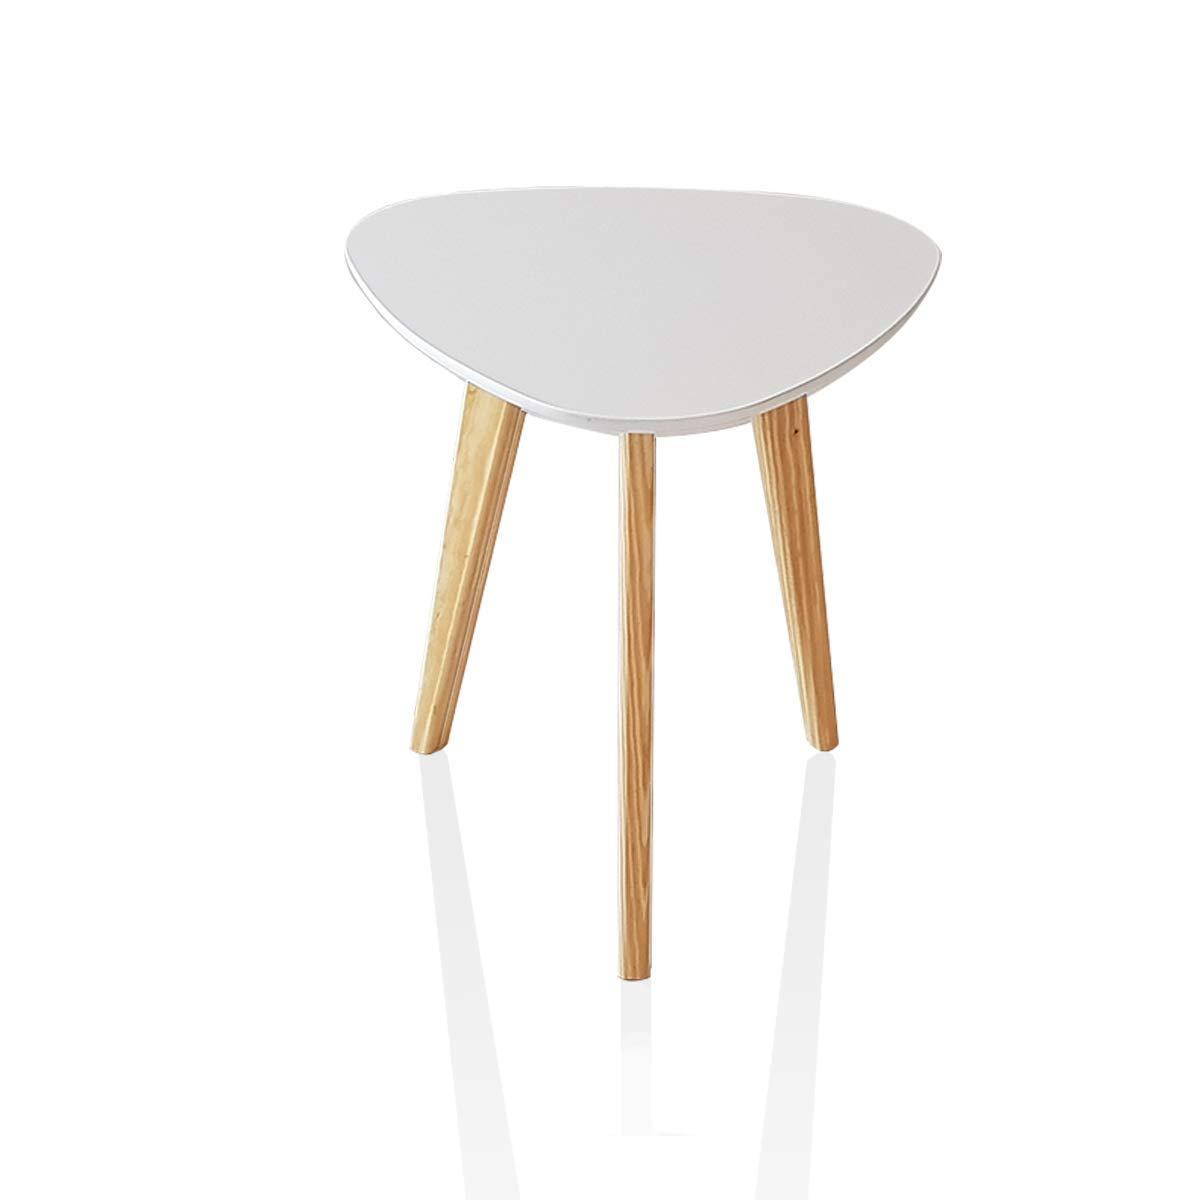 Wood Tripod End Table Stool Side Table Corner Table Sofa Side Table White